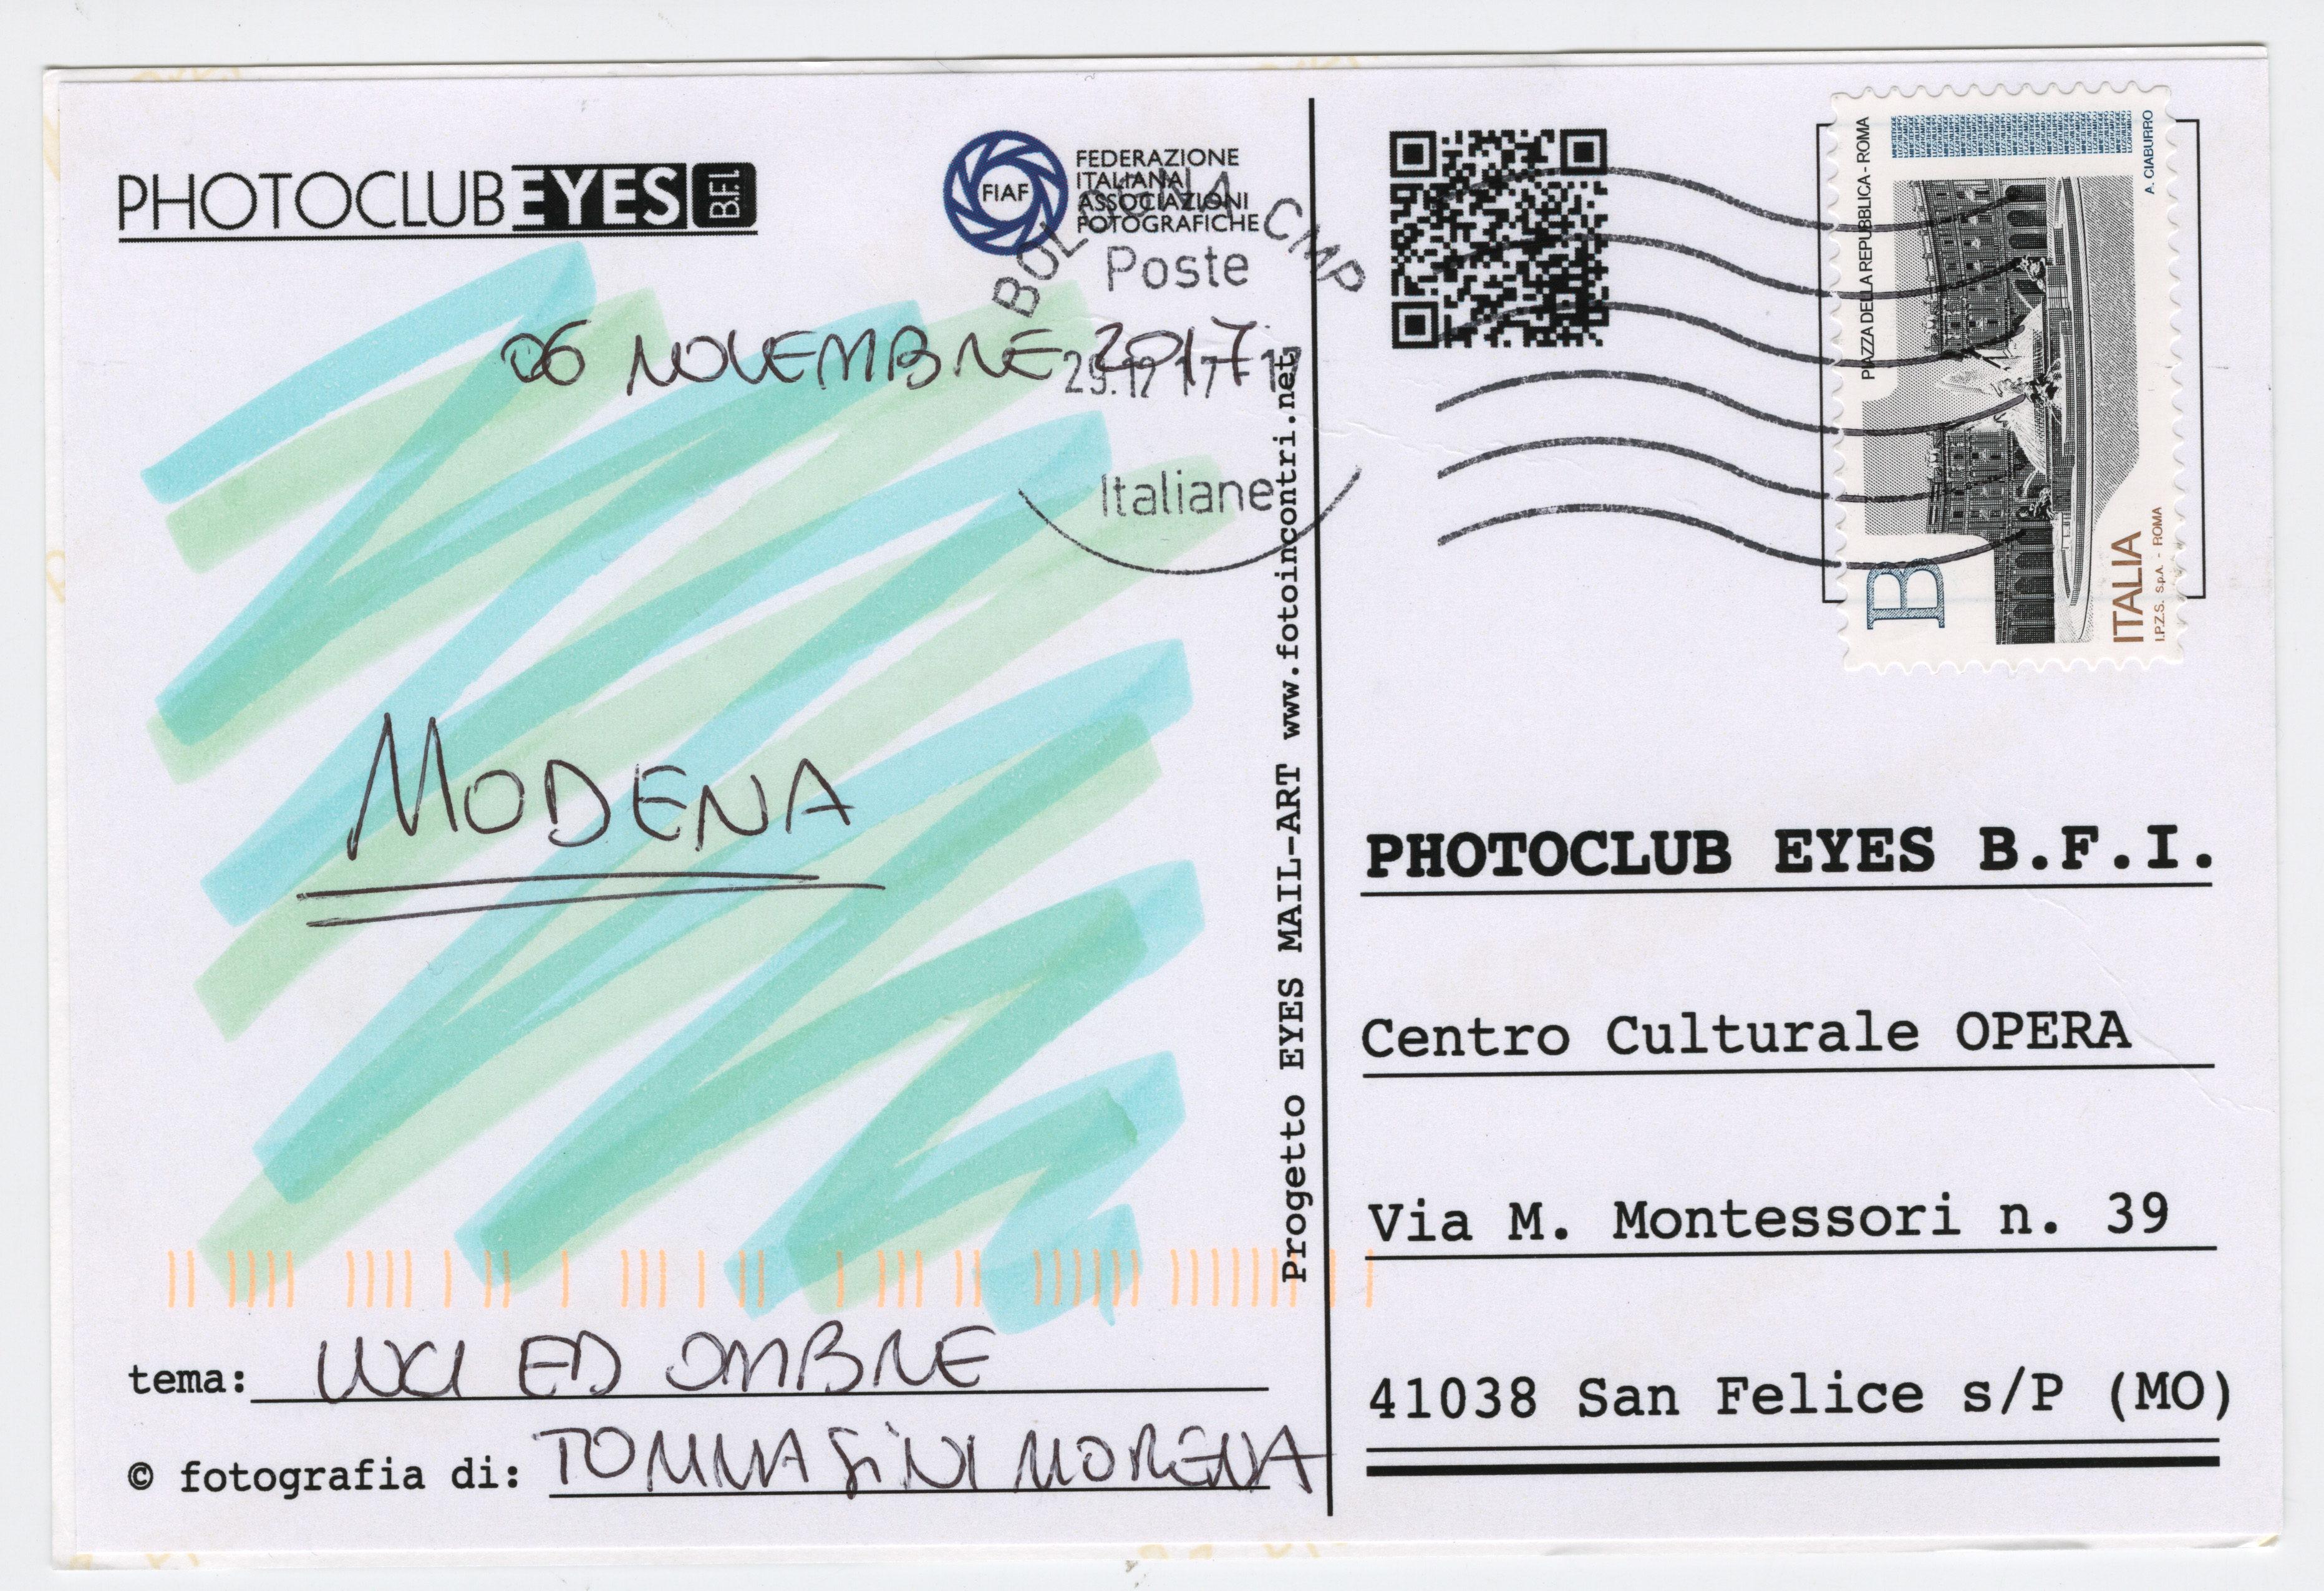 Tommasini Morena